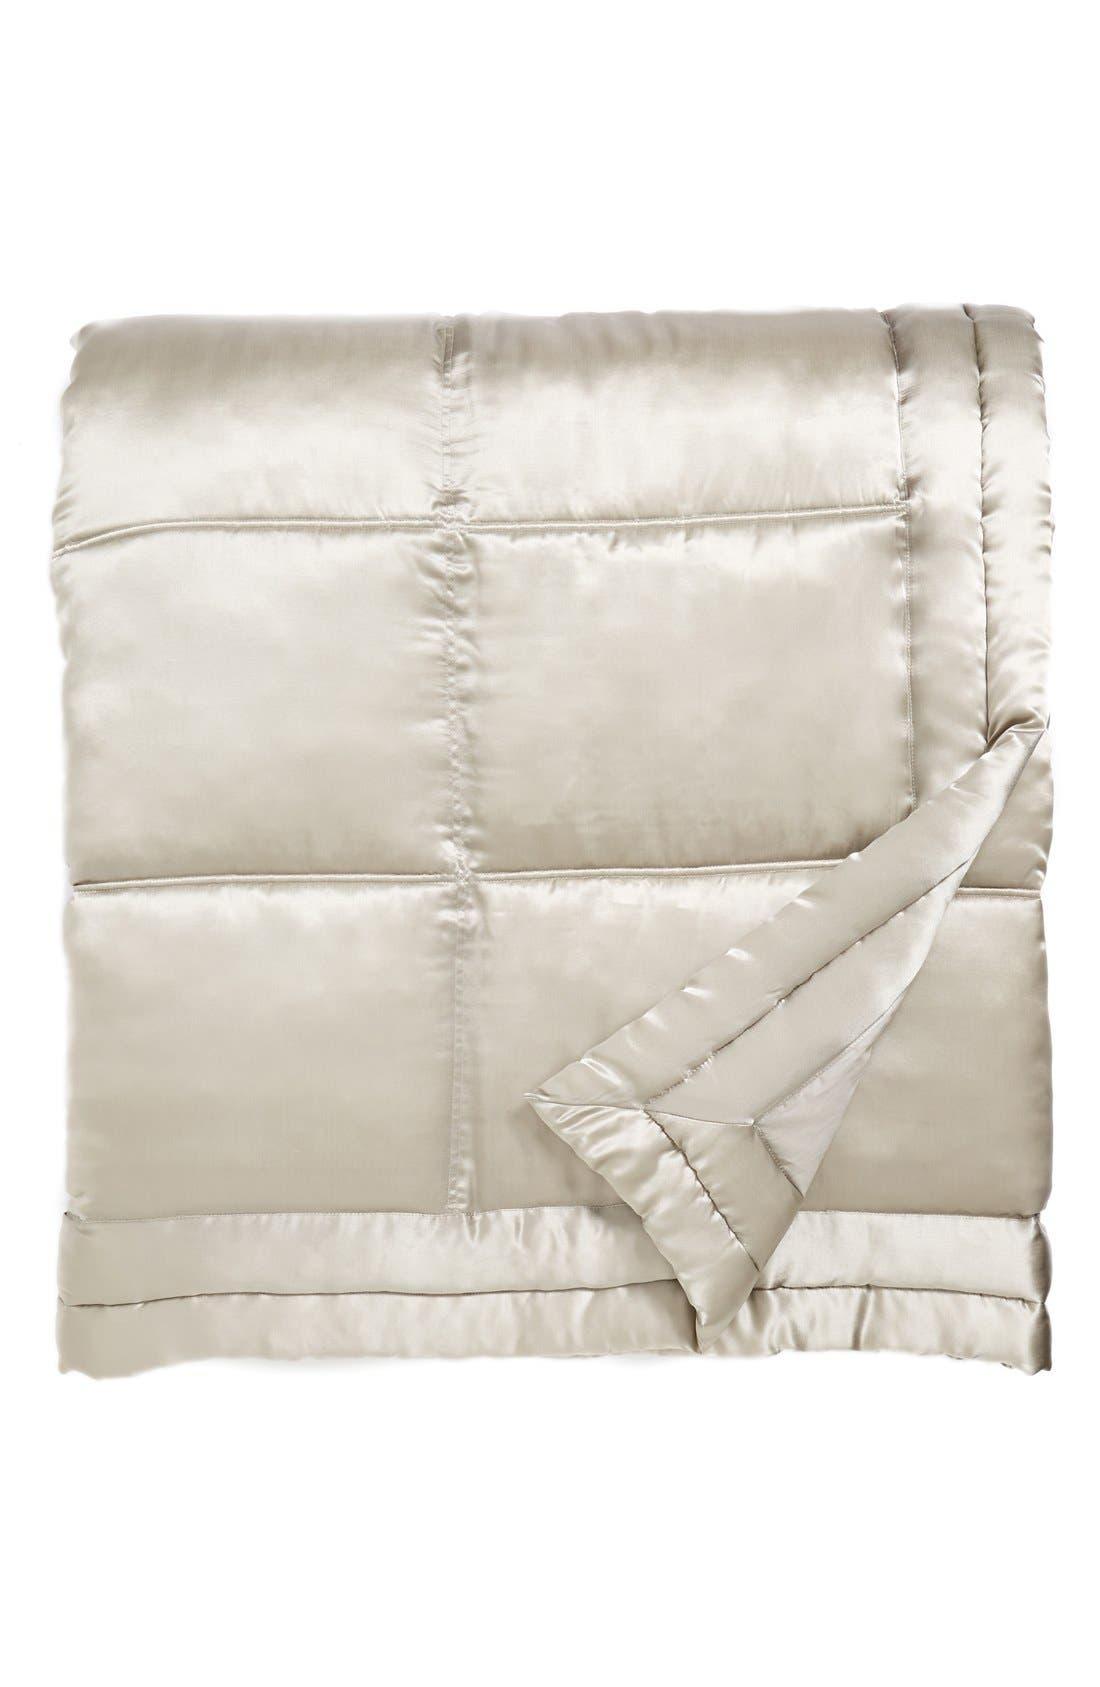 Donna Karan Collection 'Reflection' Silk Charmeuse Quilt,                             Main thumbnail 1, color,                             Silver